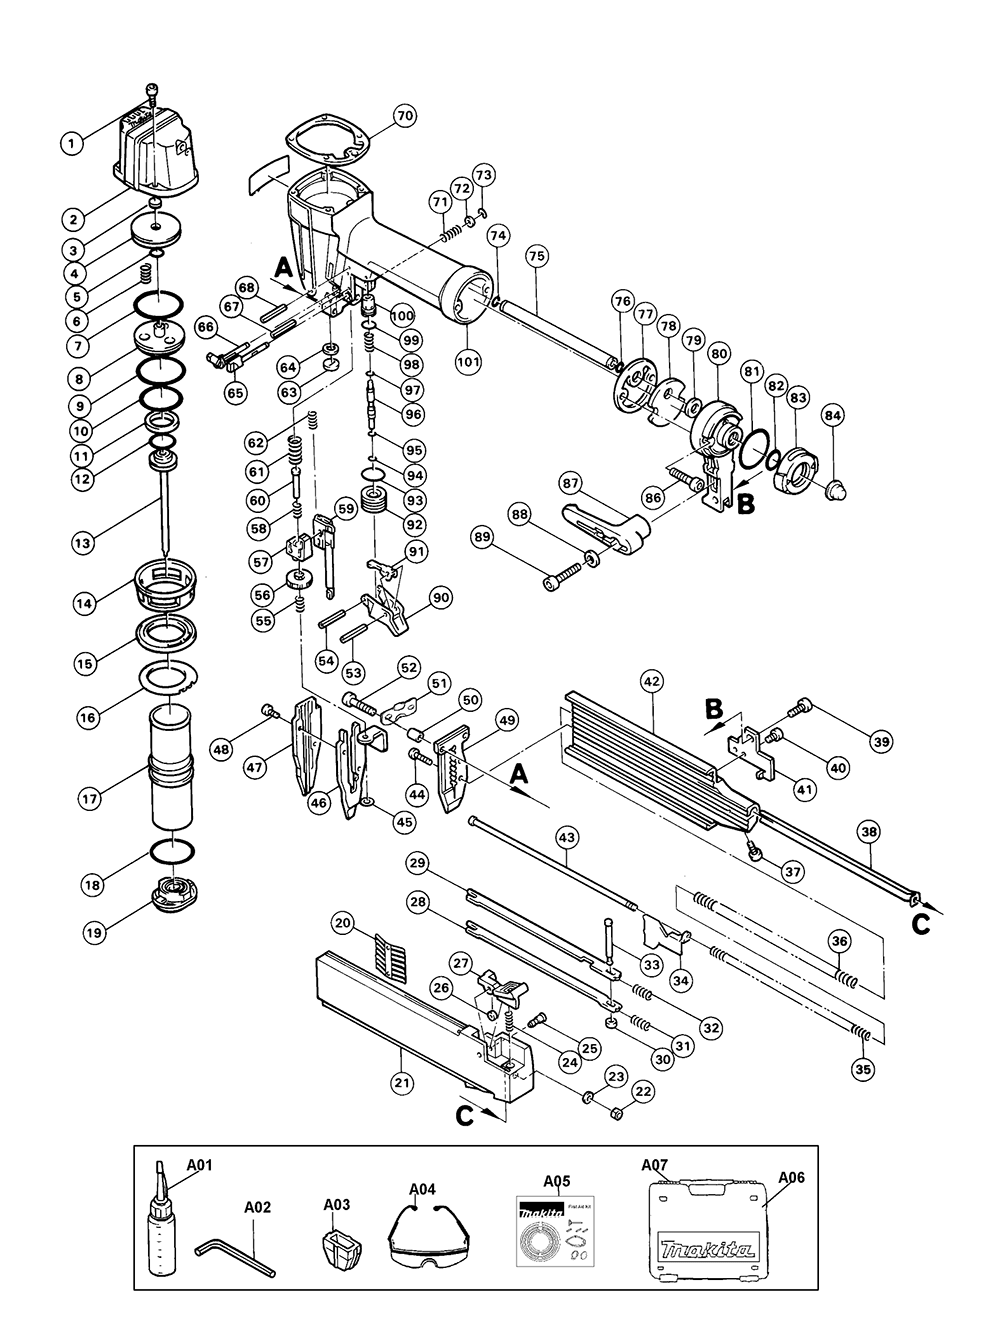 Buy Makita AF502 Type-1 2-Inch Brad (18 Gauge) Replacement